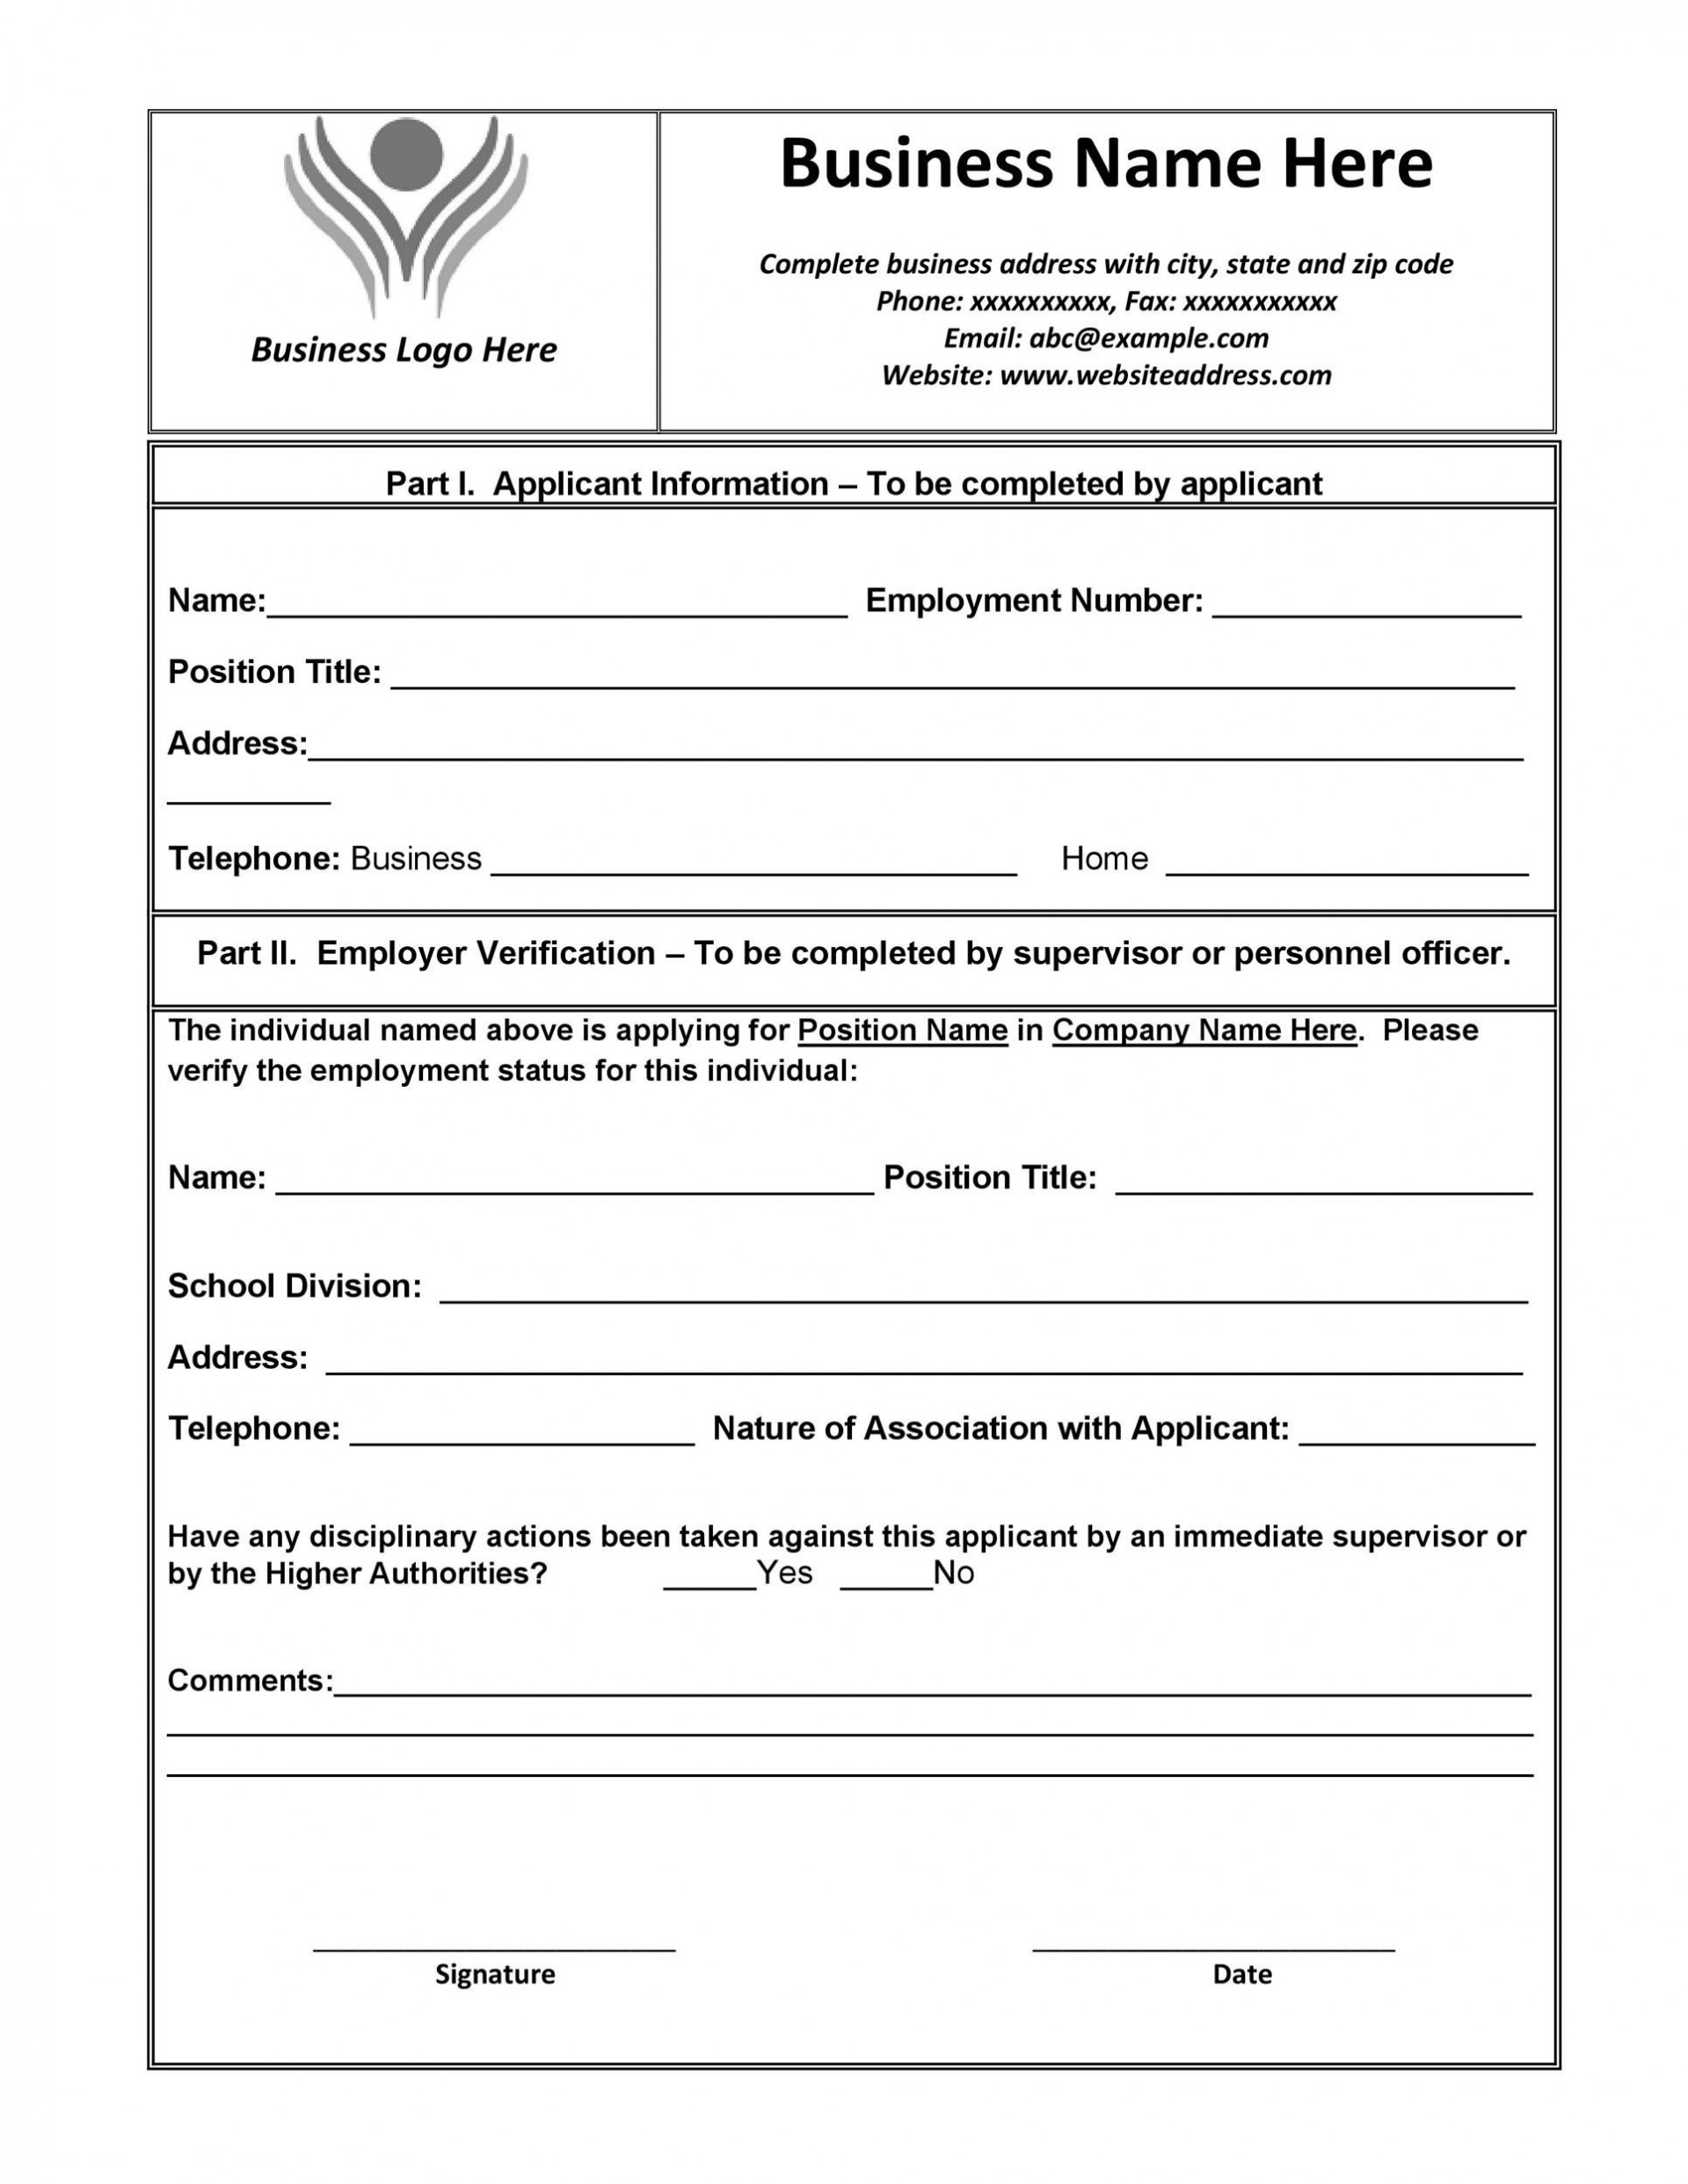 006 Rare Free Income Verification Form Template Picture 1920